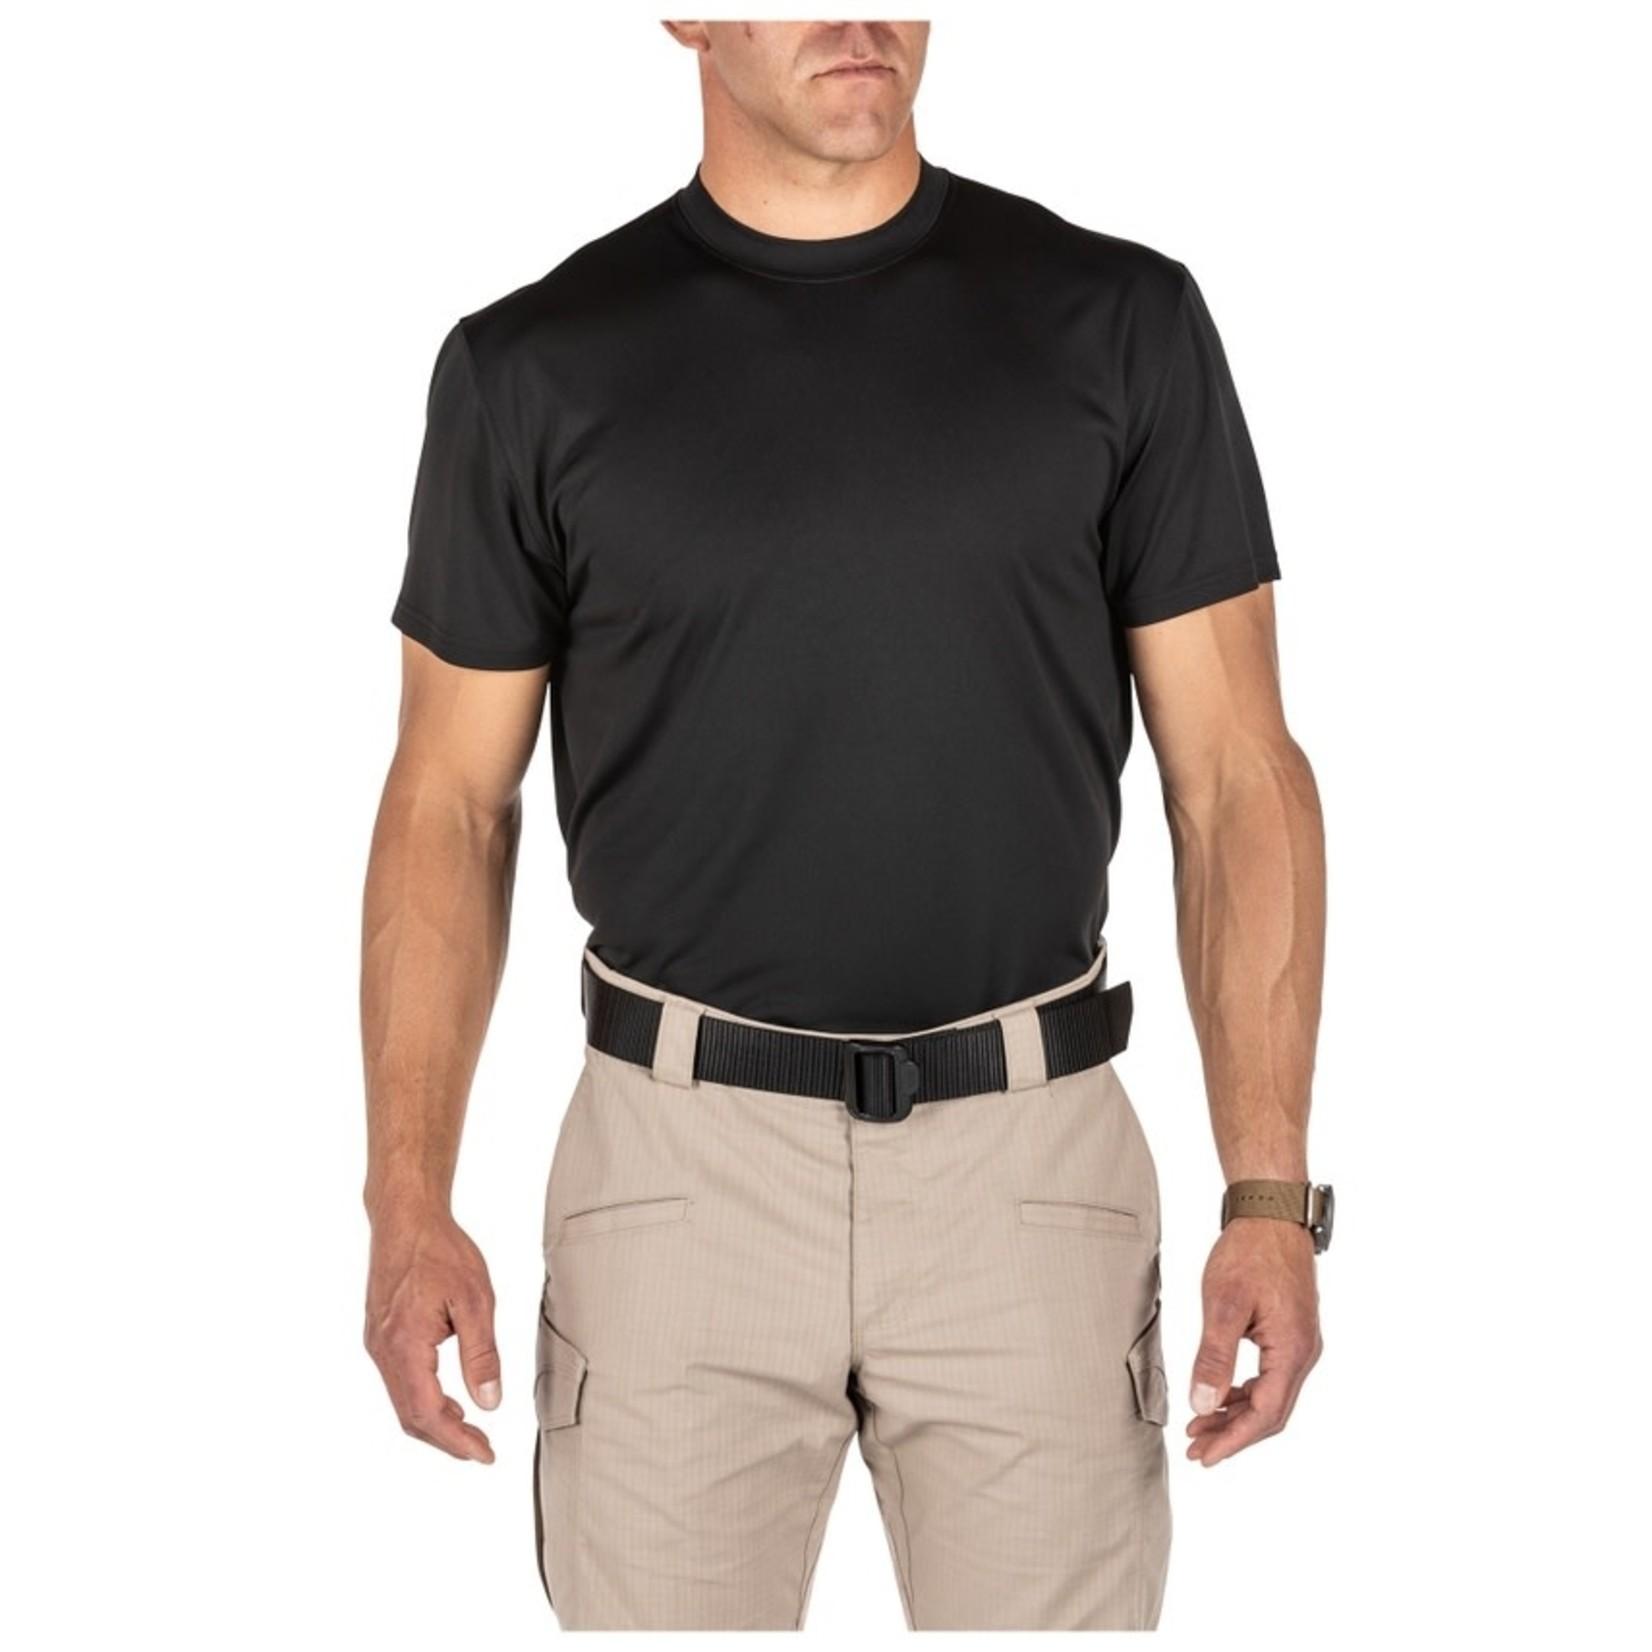 5.11 Tactical 5.11 Men's Performance Utility T-Shirt 2pk Black